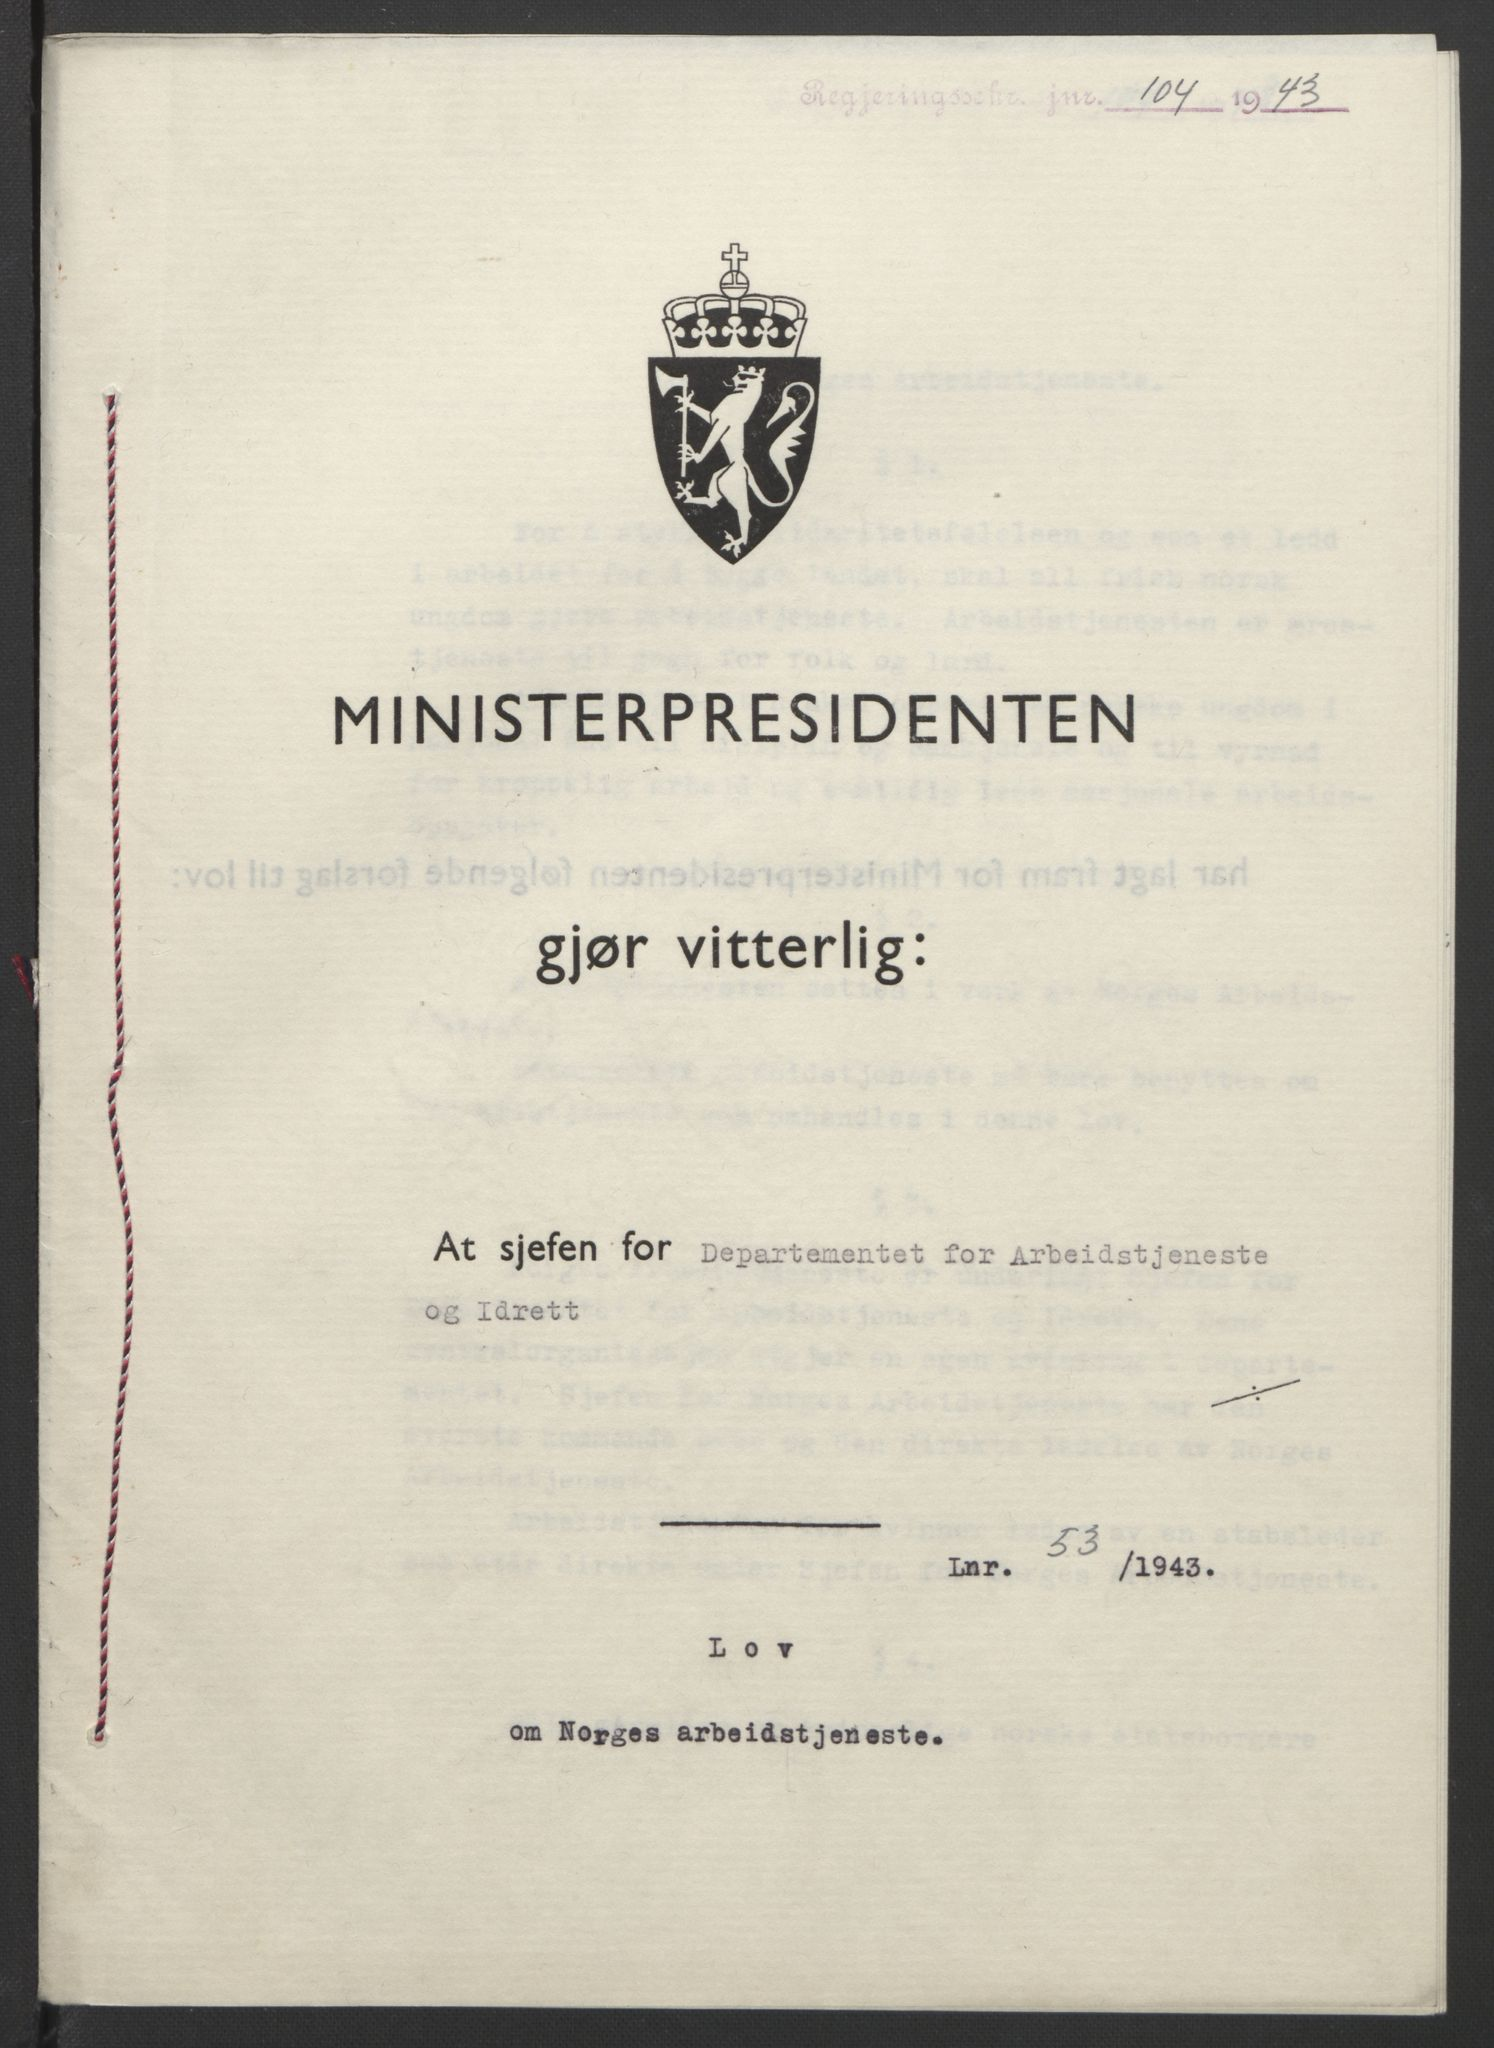 RA, NS-administrasjonen 1940-1945 (Statsrådsekretariatet, de kommisariske statsråder mm), D/Db/L0099: Lover, 1943, s. 230